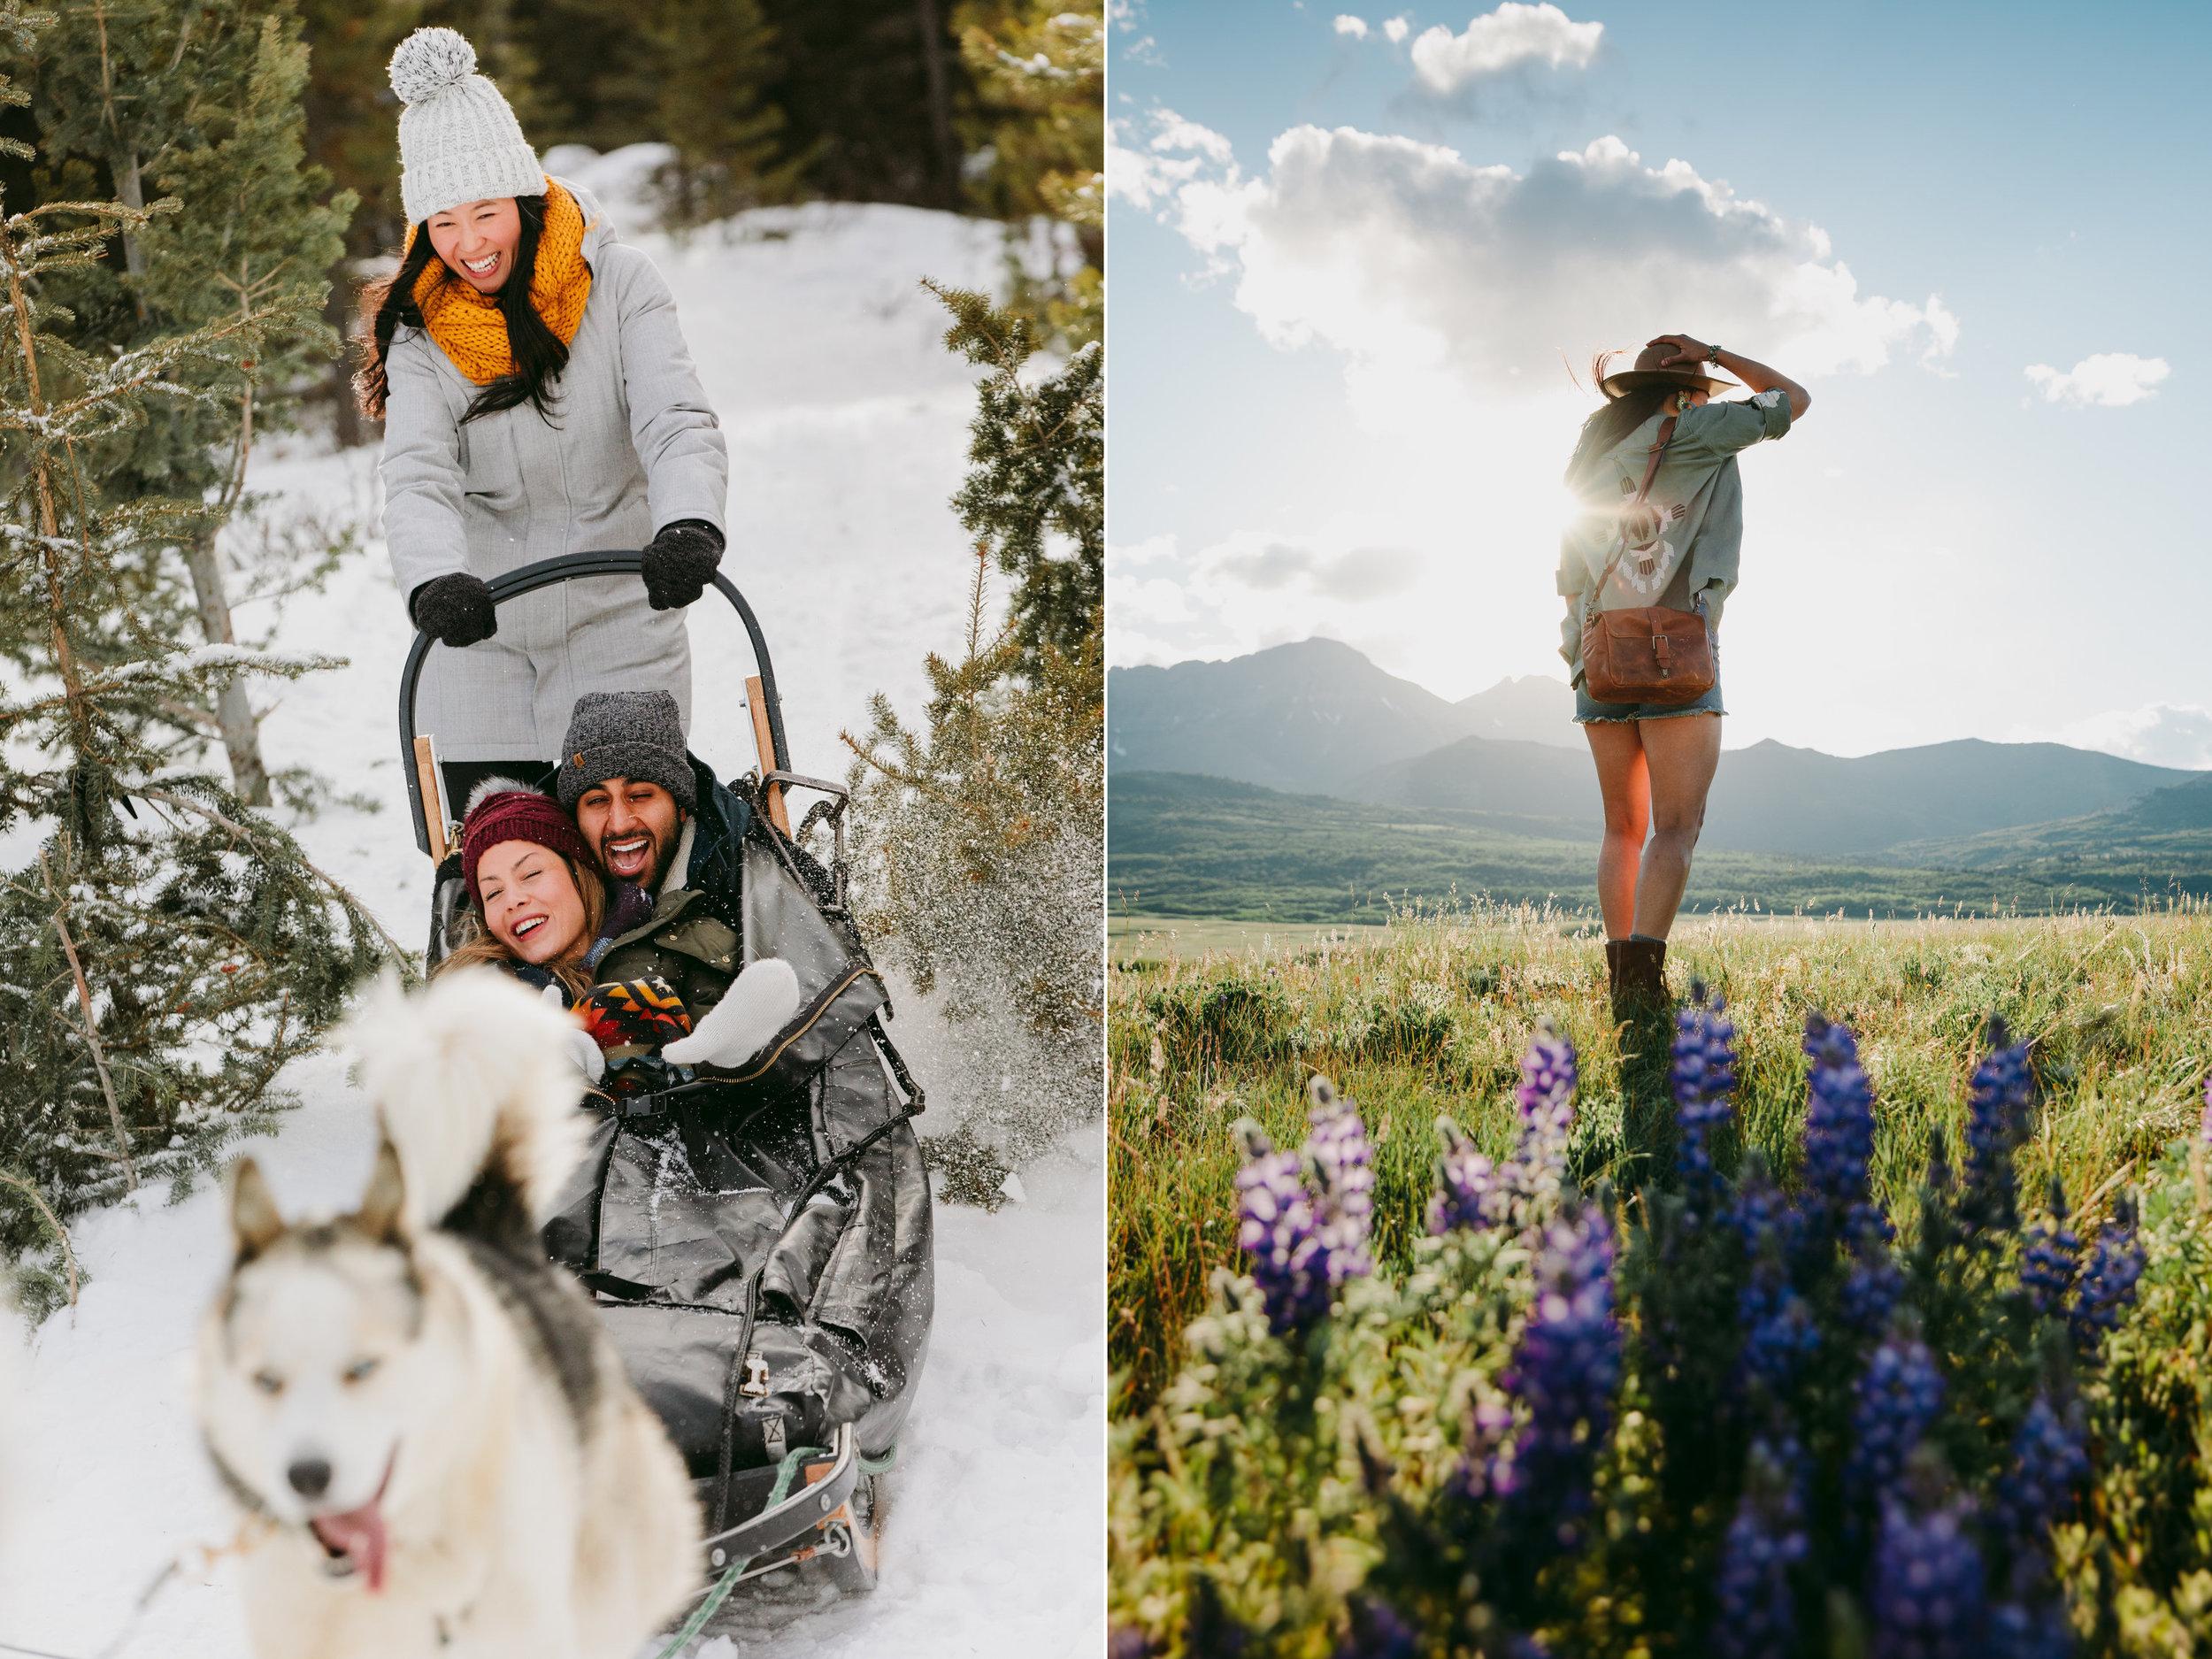 MikeSeehagel-TravelAlberta-Ready-Rebrand_Canada-LifestylePhotography_16-2.jpg